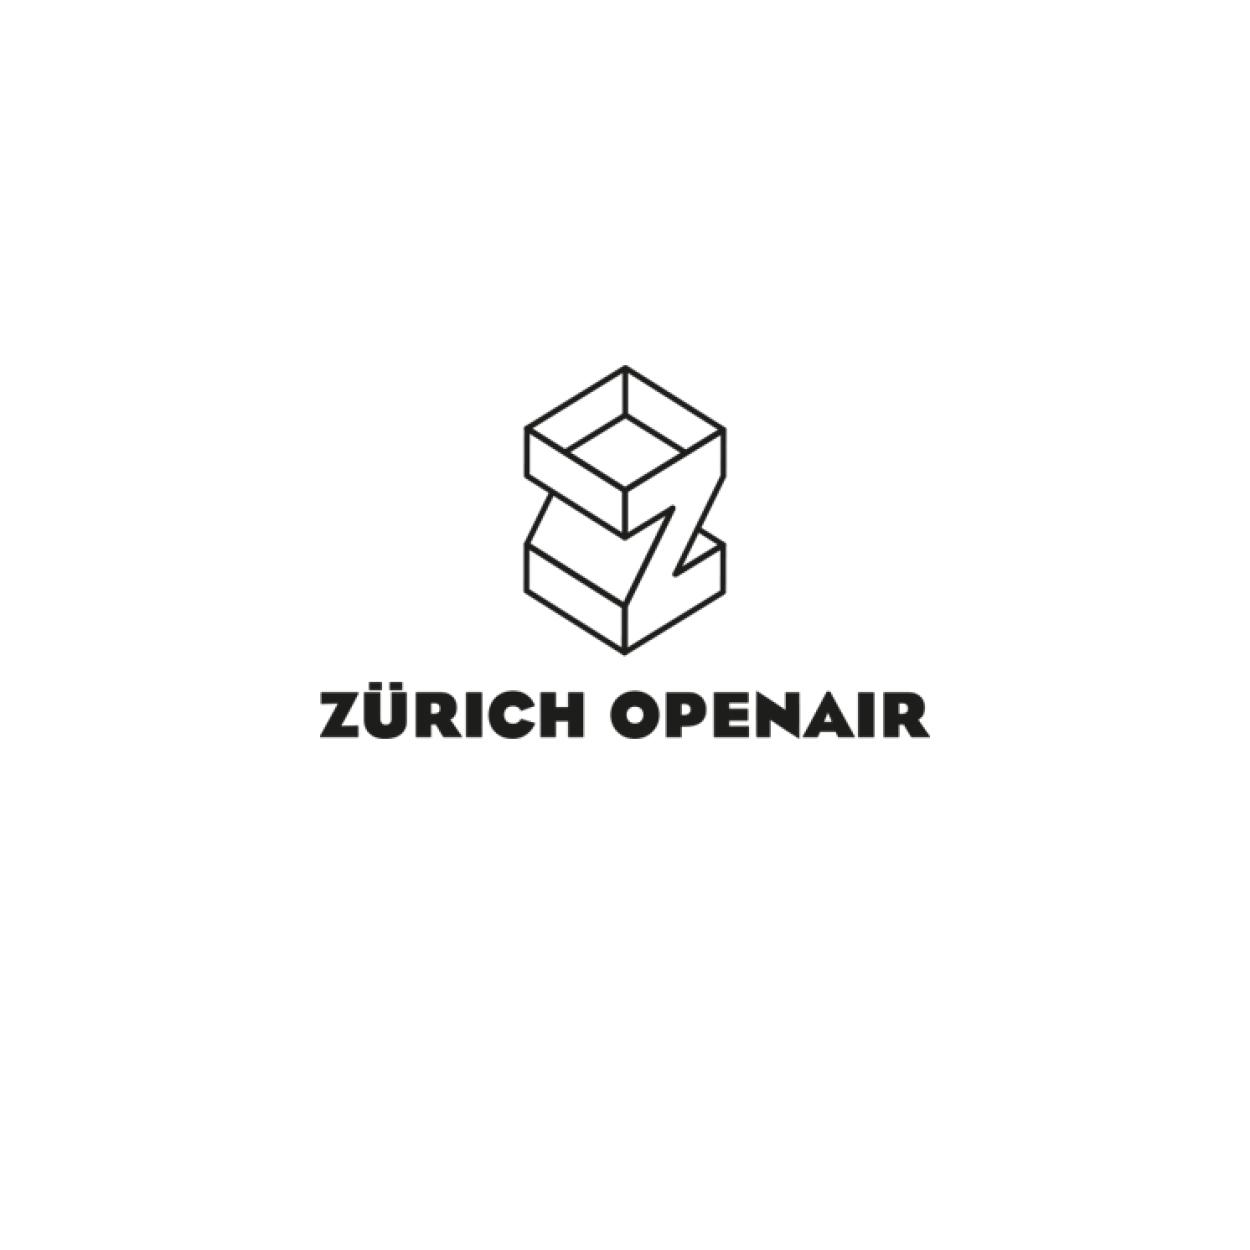 thumb_ZurichOpenair.jpg